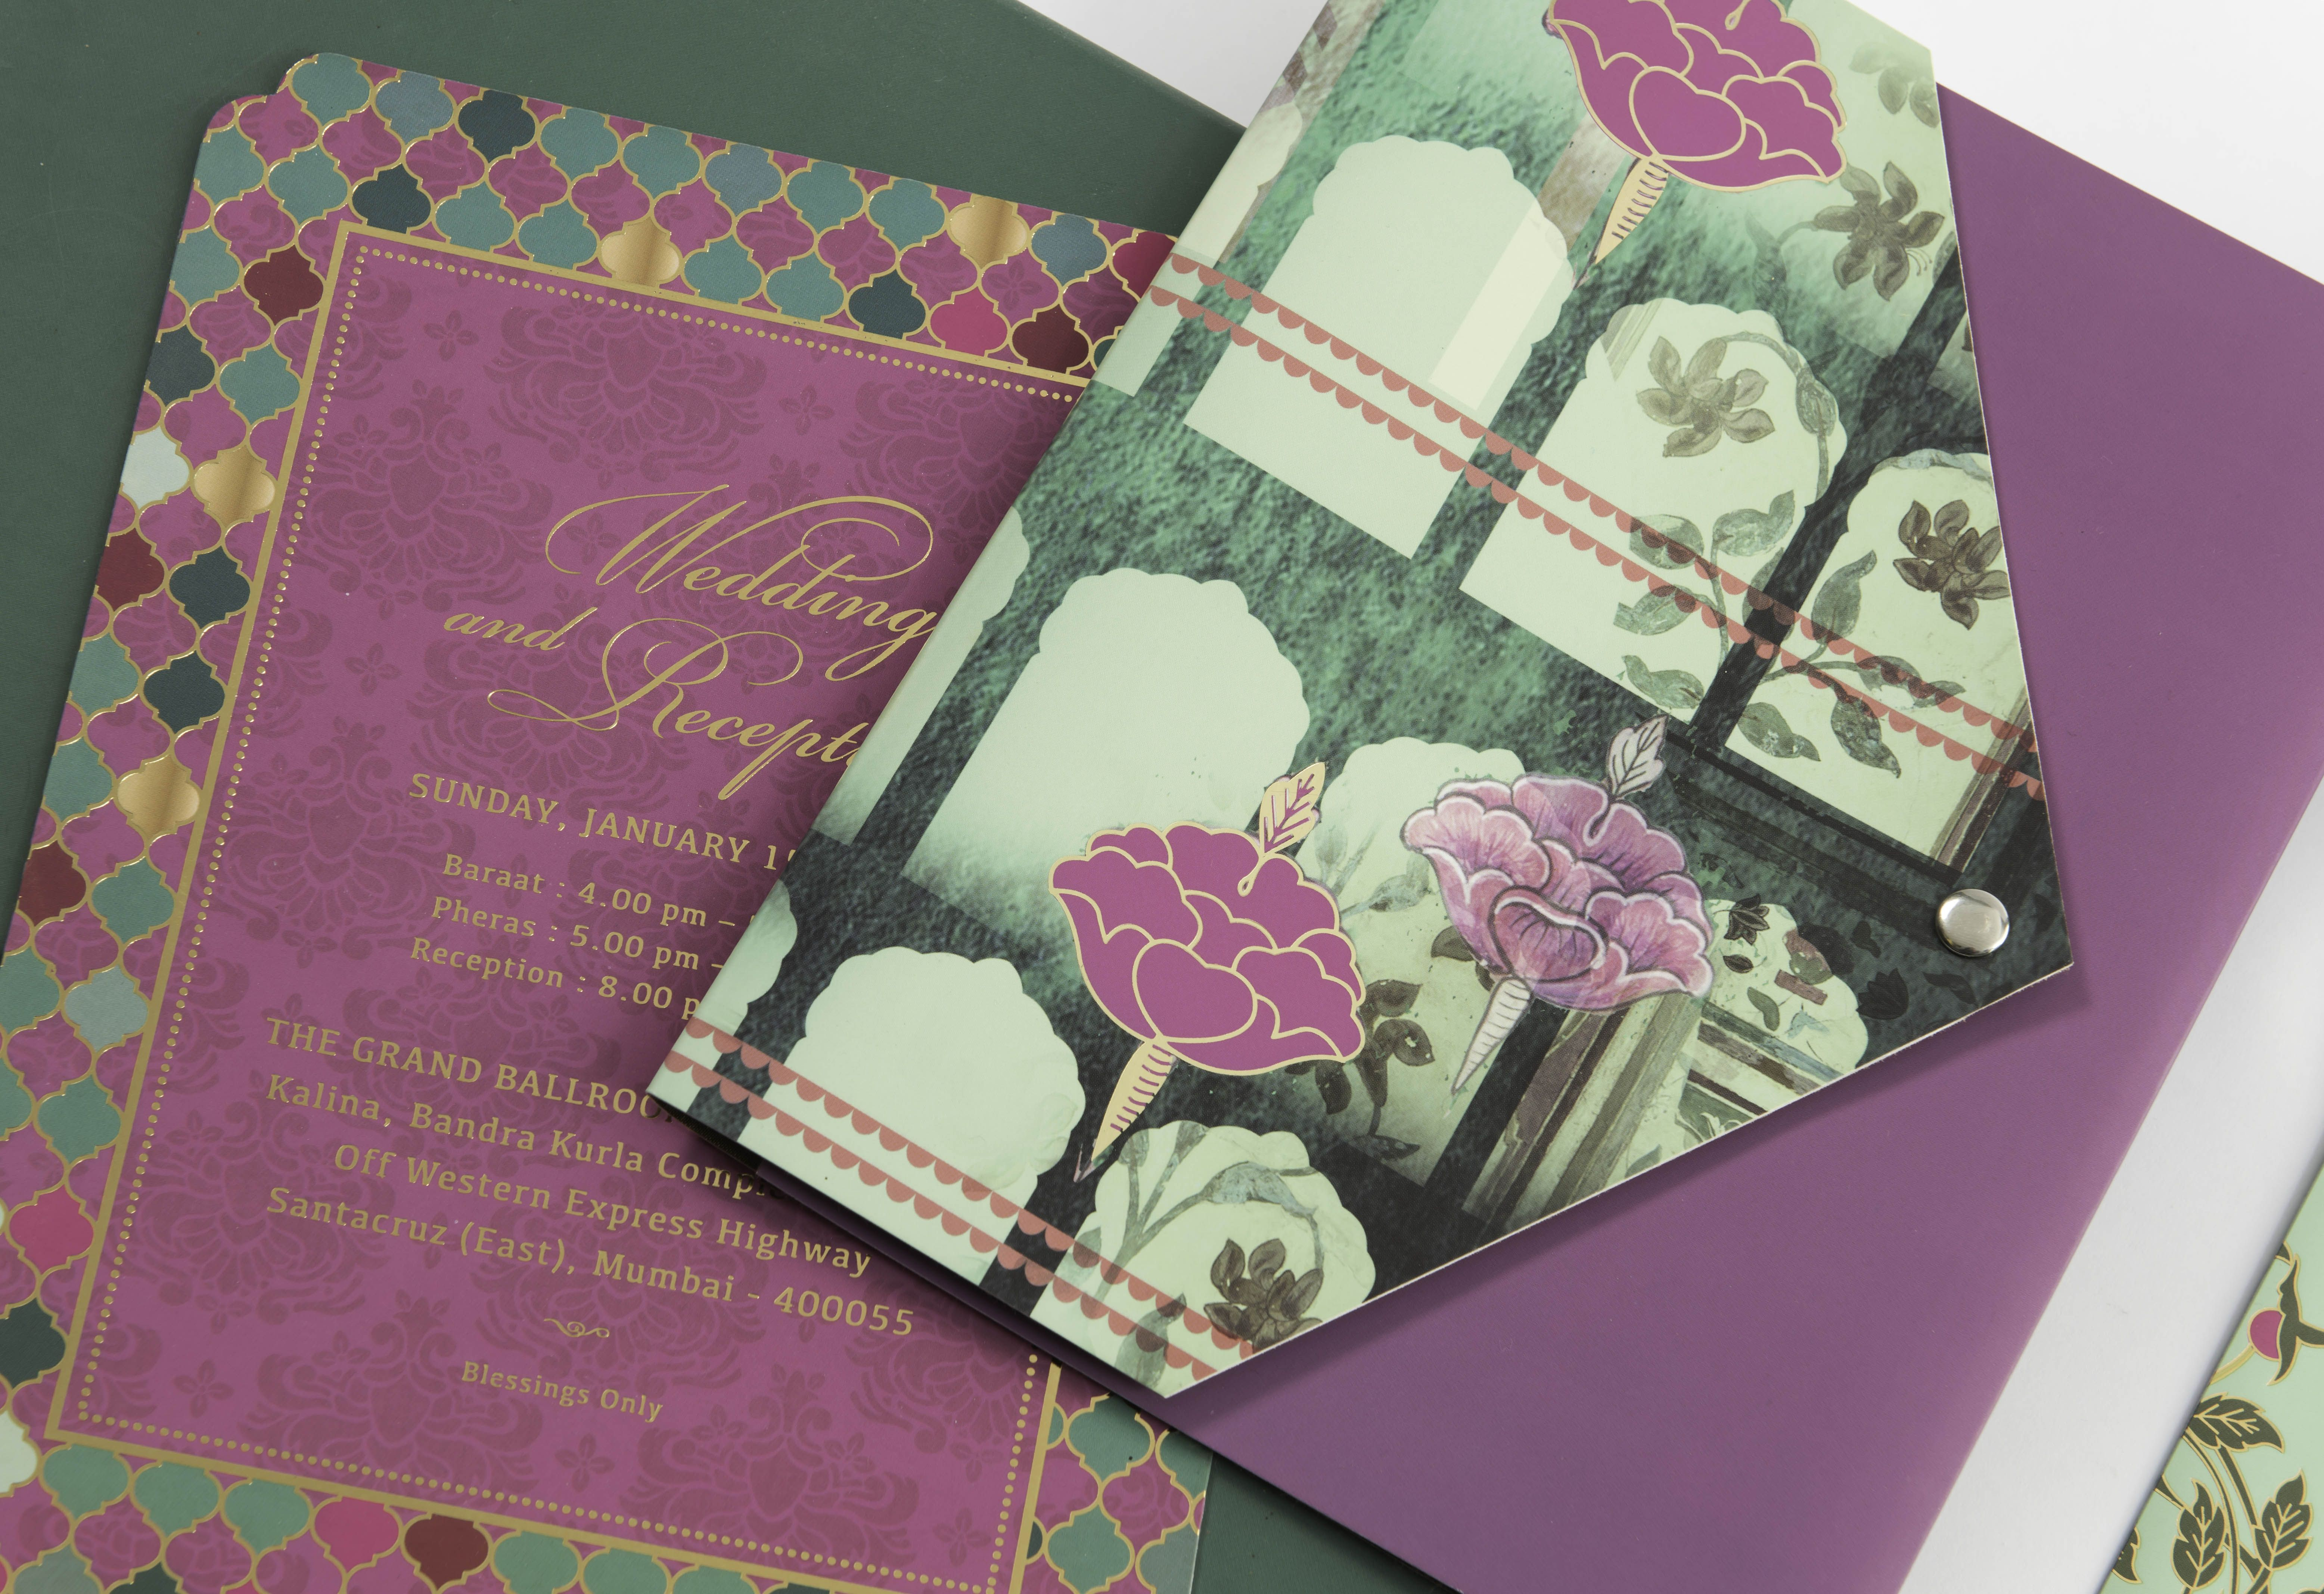 Emerald City Palace Wedding Invitation Folder Style with